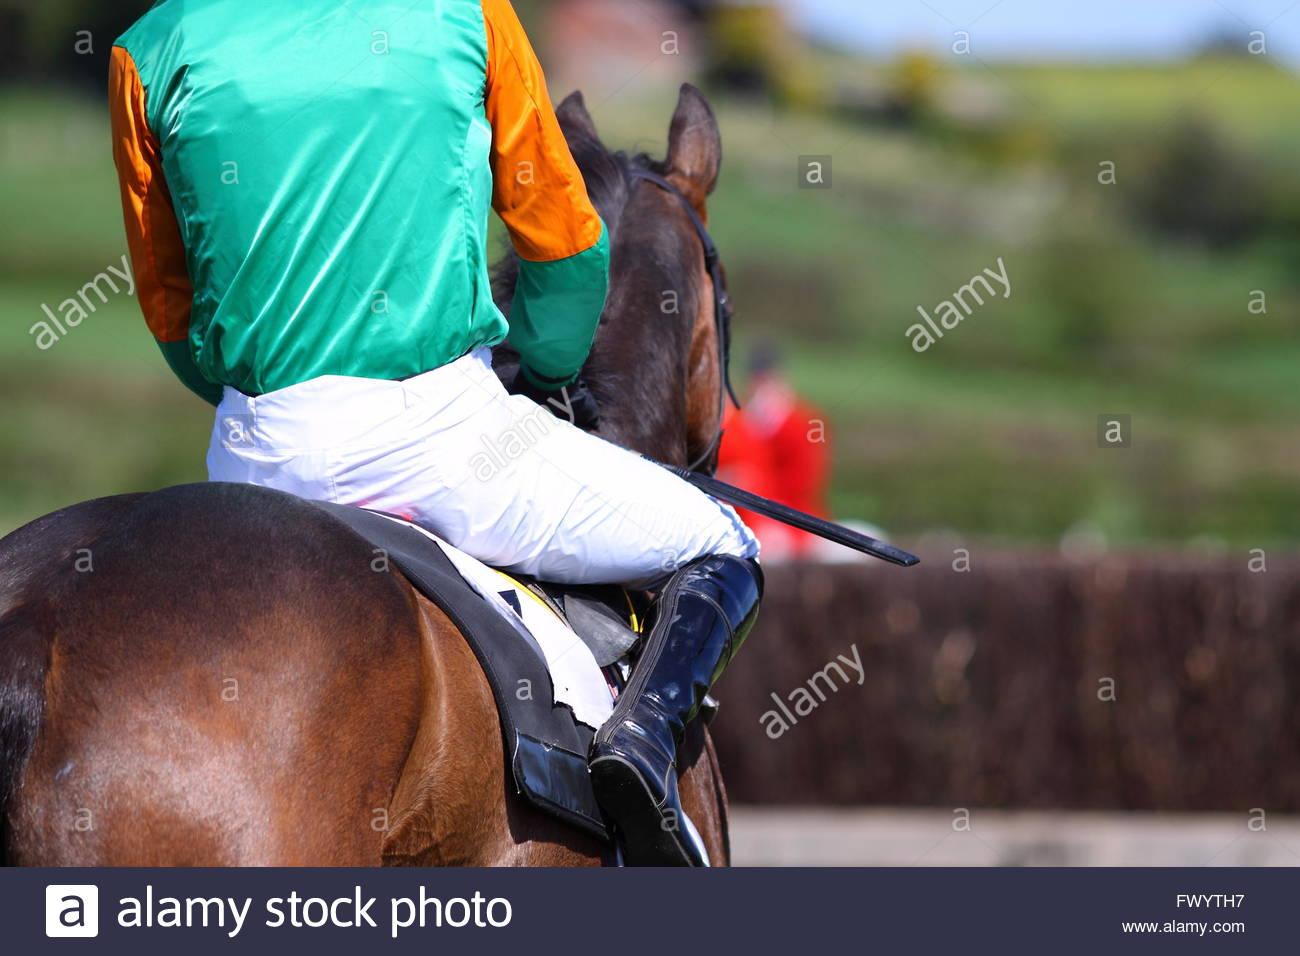 Carrera de caballos JINETE jinete Imagen De Stock